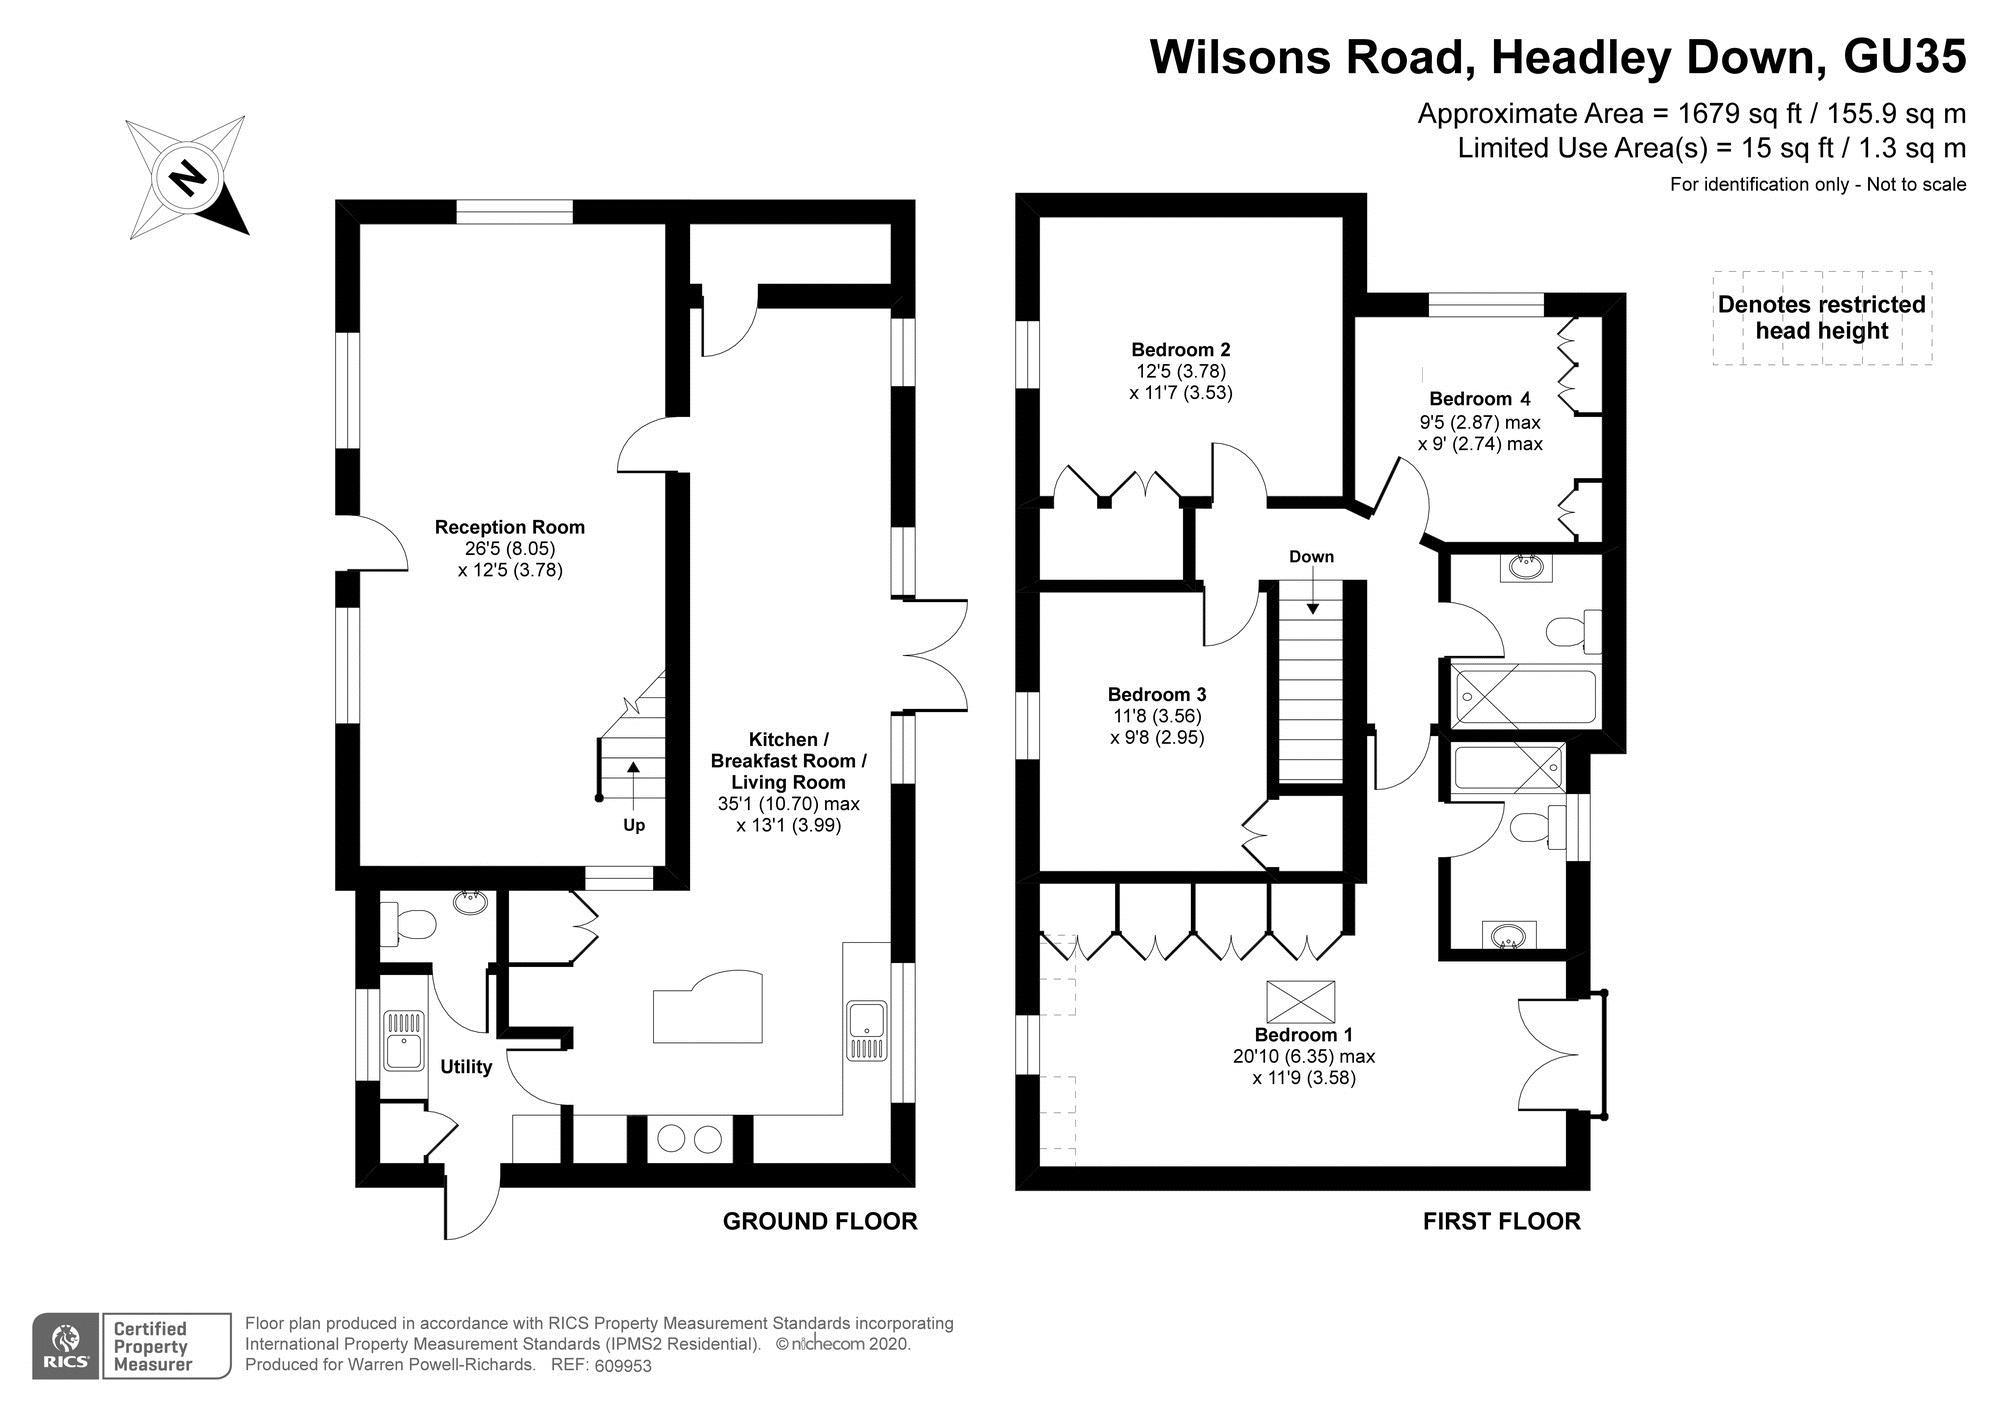 Wilsons Road